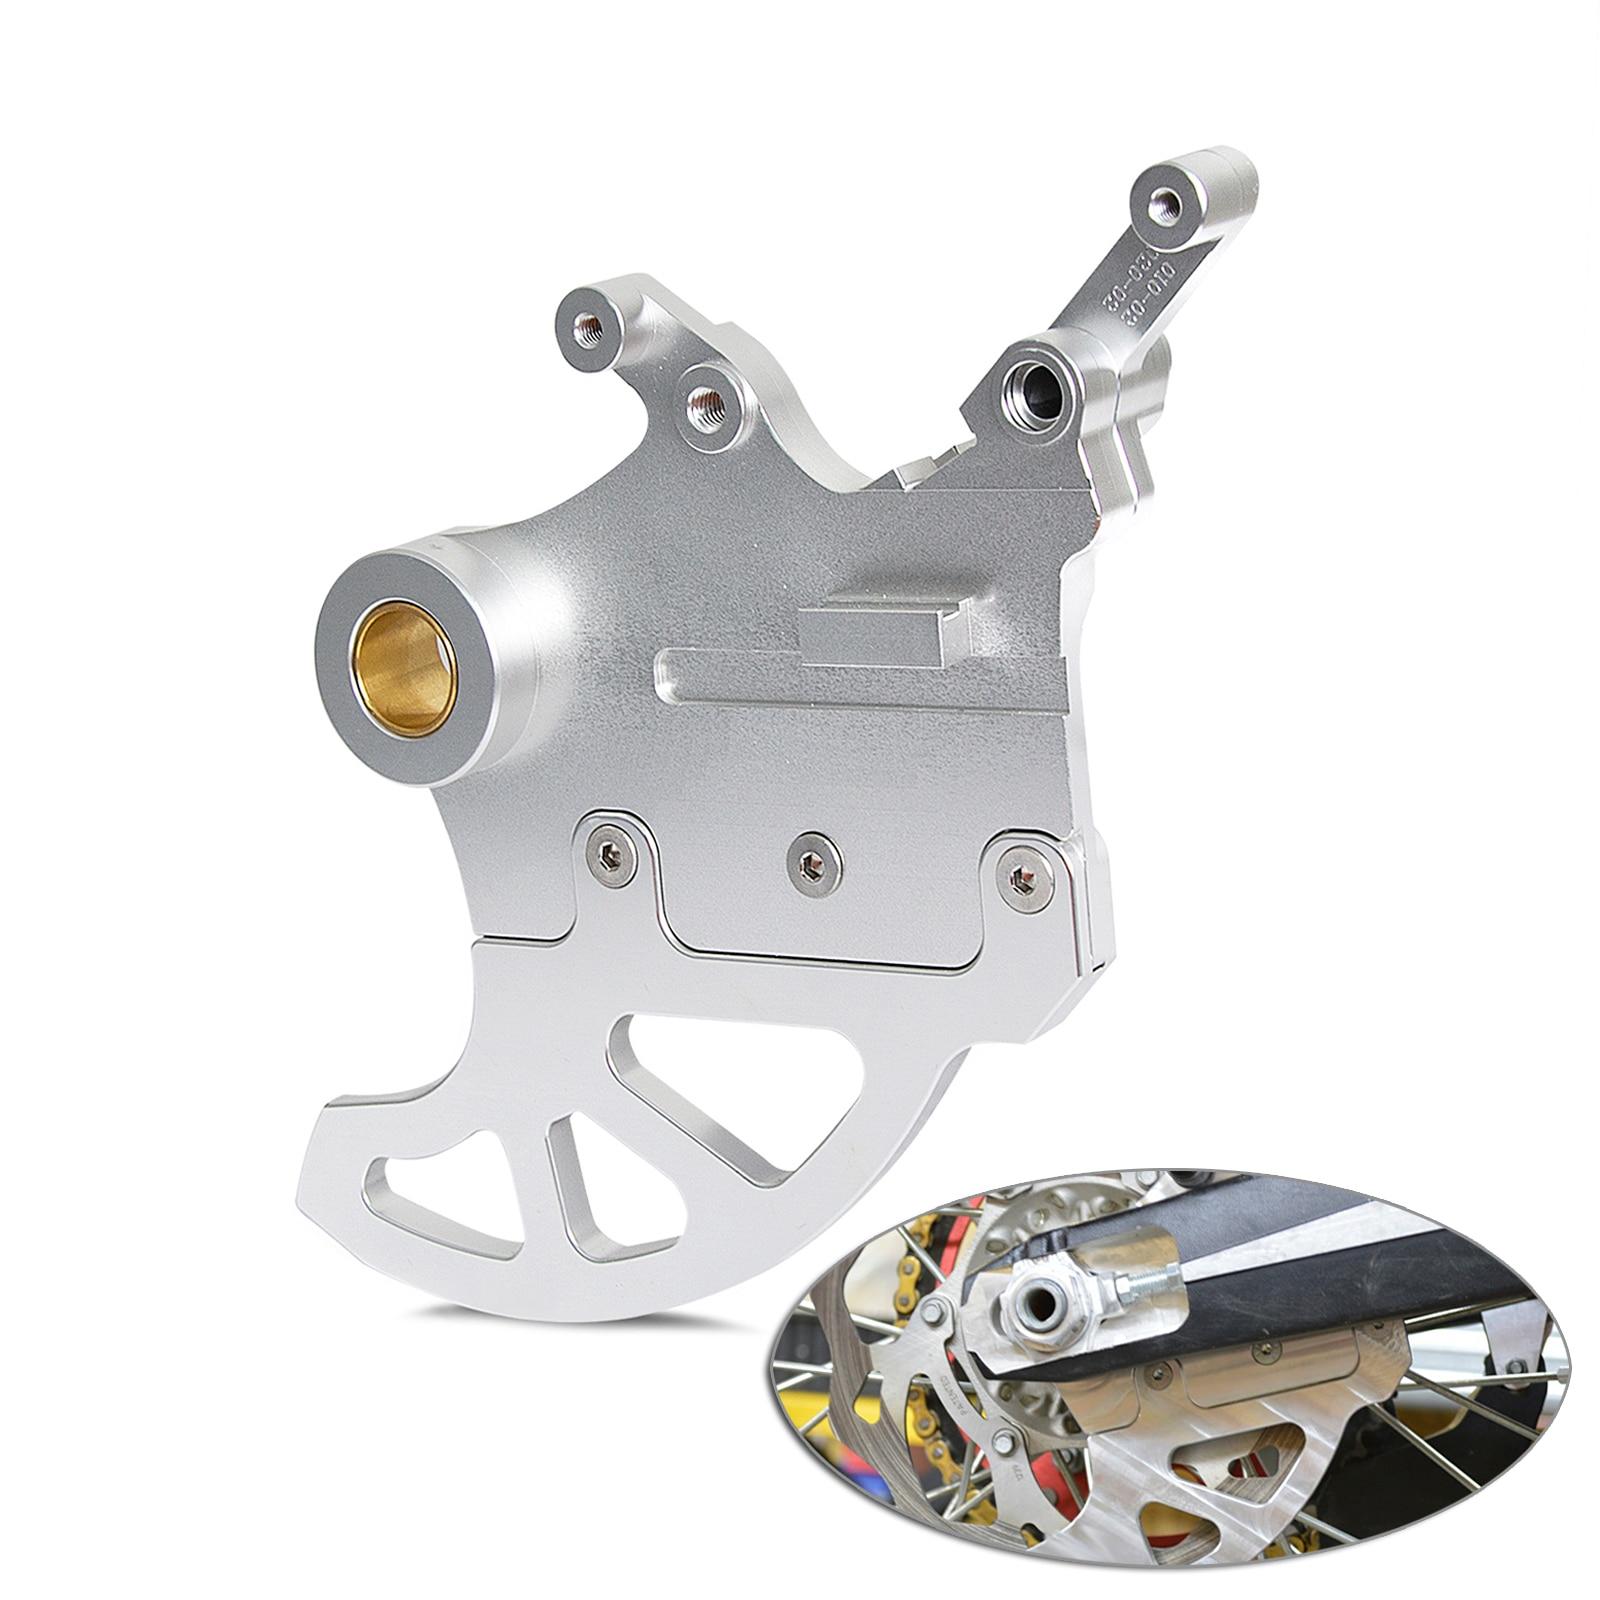 Rear Brake Disc Guard Protector For Yamaha YZF250 YZF450 YZ125 YZ250 WR250 WR450 2006-2013 2014 2015 2016 2017 2018 YZF 250 450Rear Brake Disc Guard Protector For Yamaha YZF250 YZF450 YZ125 YZ250 WR250 WR450 2006-2013 2014 2015 2016 2017 2018 YZF 250 450